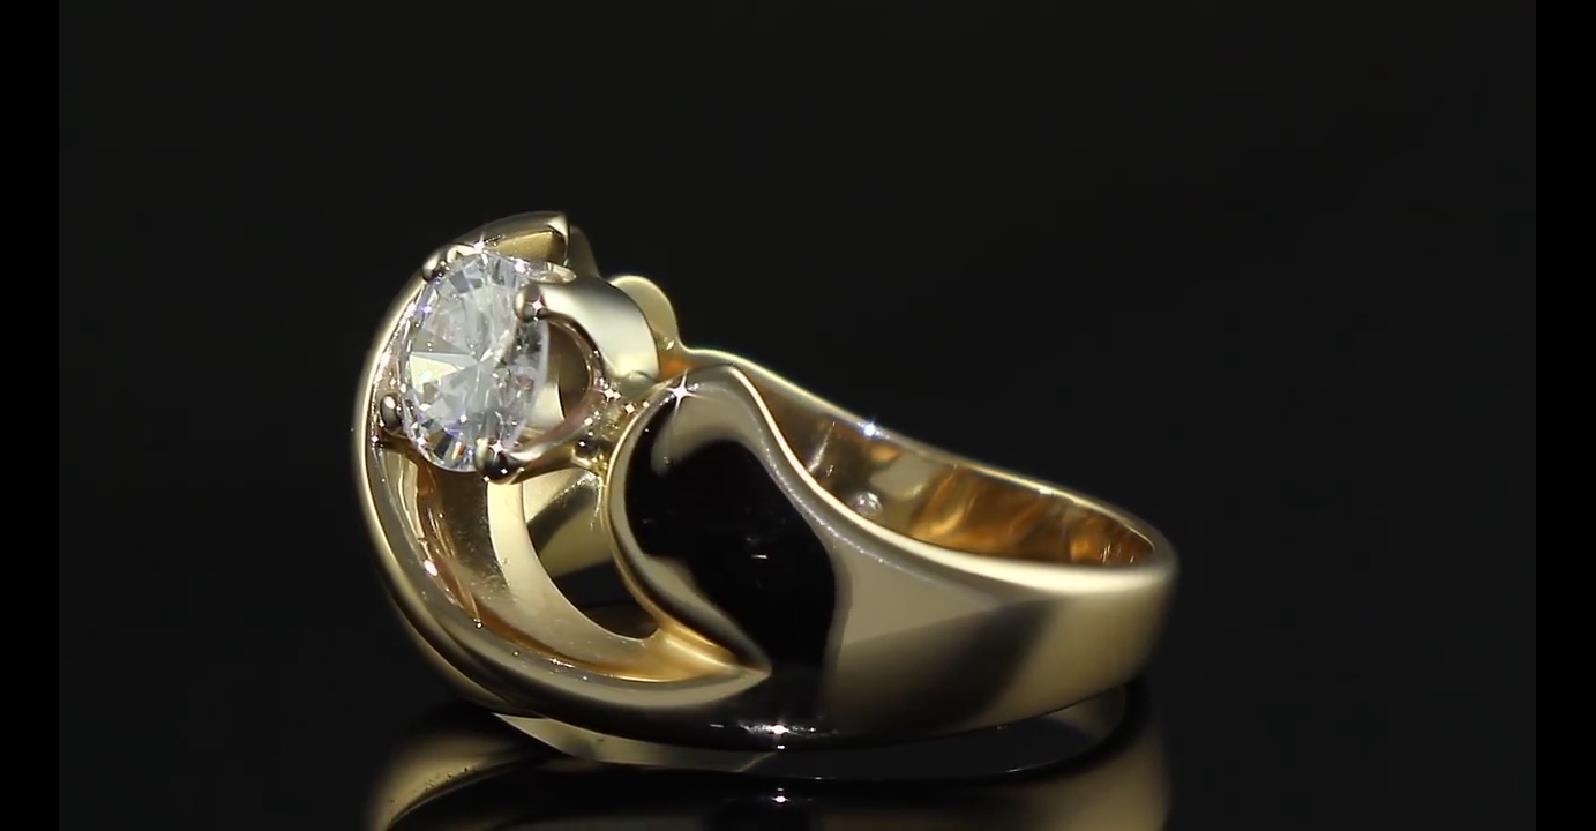 BS 020 BS 18 钻戒展示 珠宝工艺 珠宝设计 珠宝展示_8